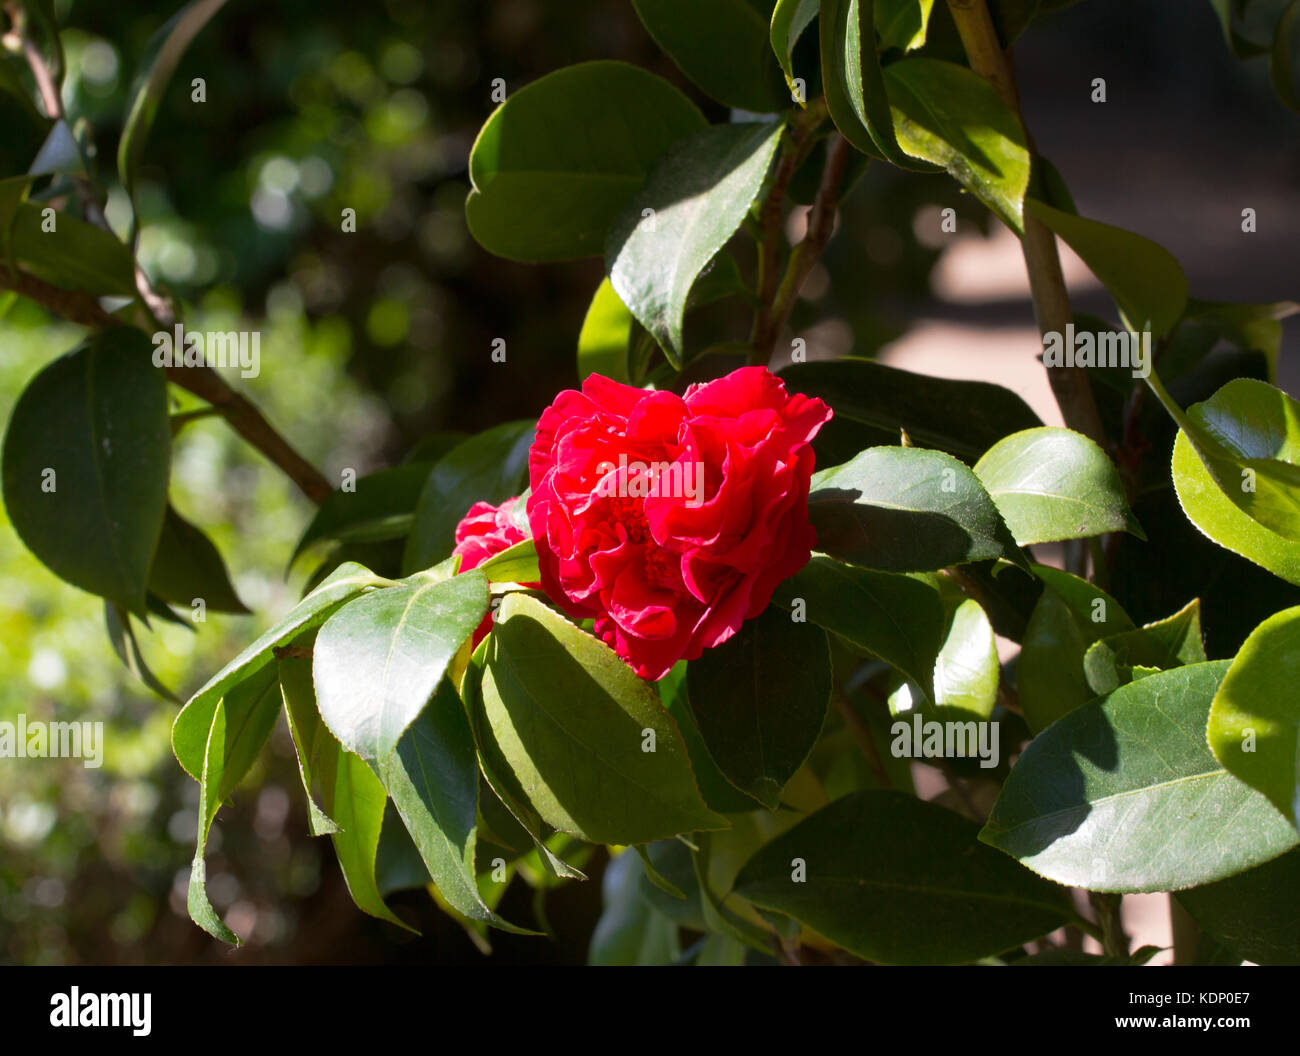 Bud camellia flower. Camelia japonica in gaden, Spagna. Immagini Stock